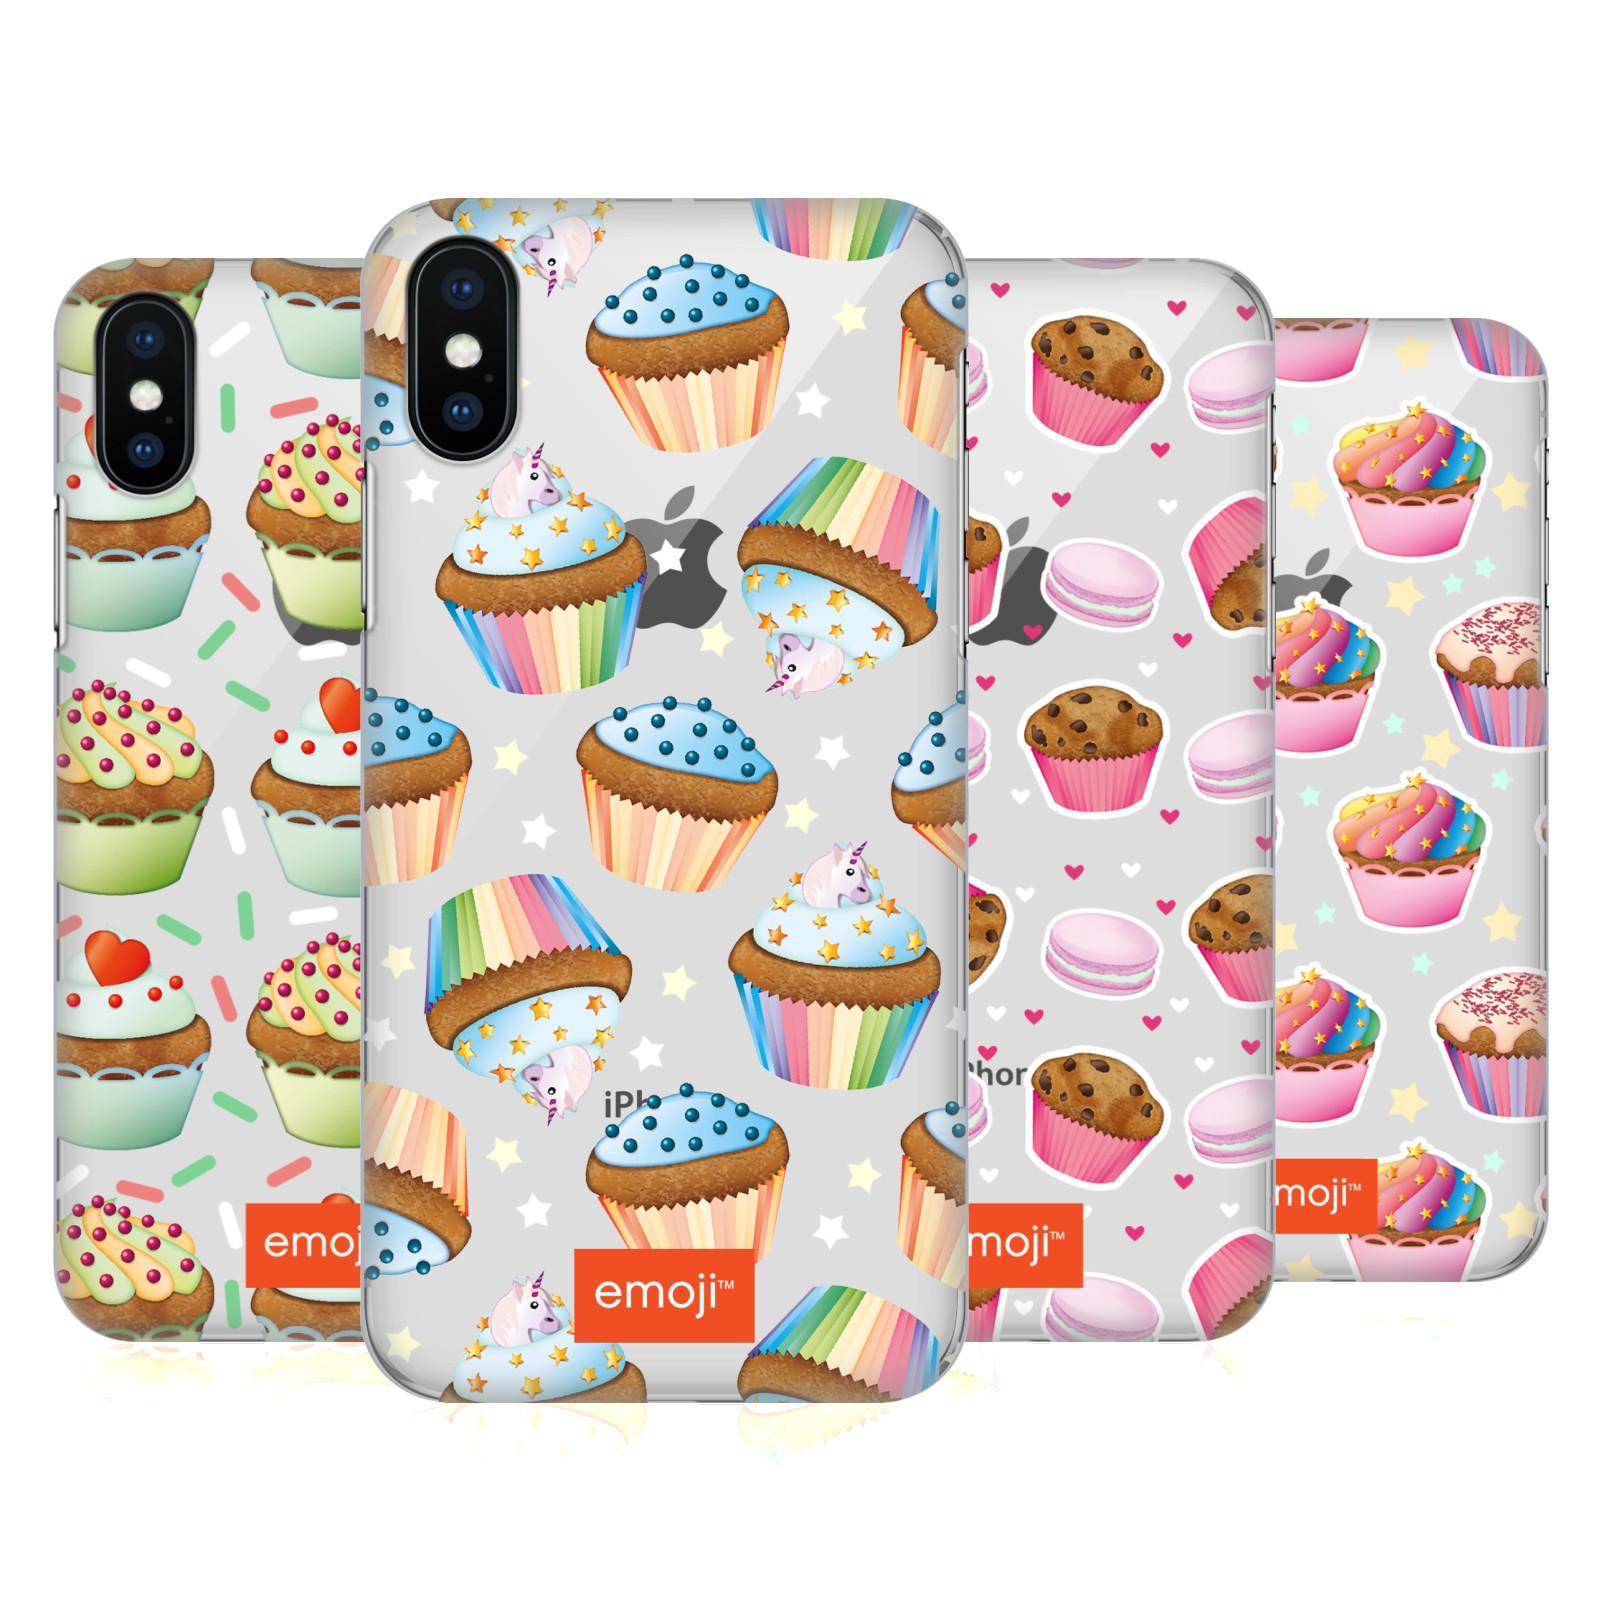 emoji® Cupcakes